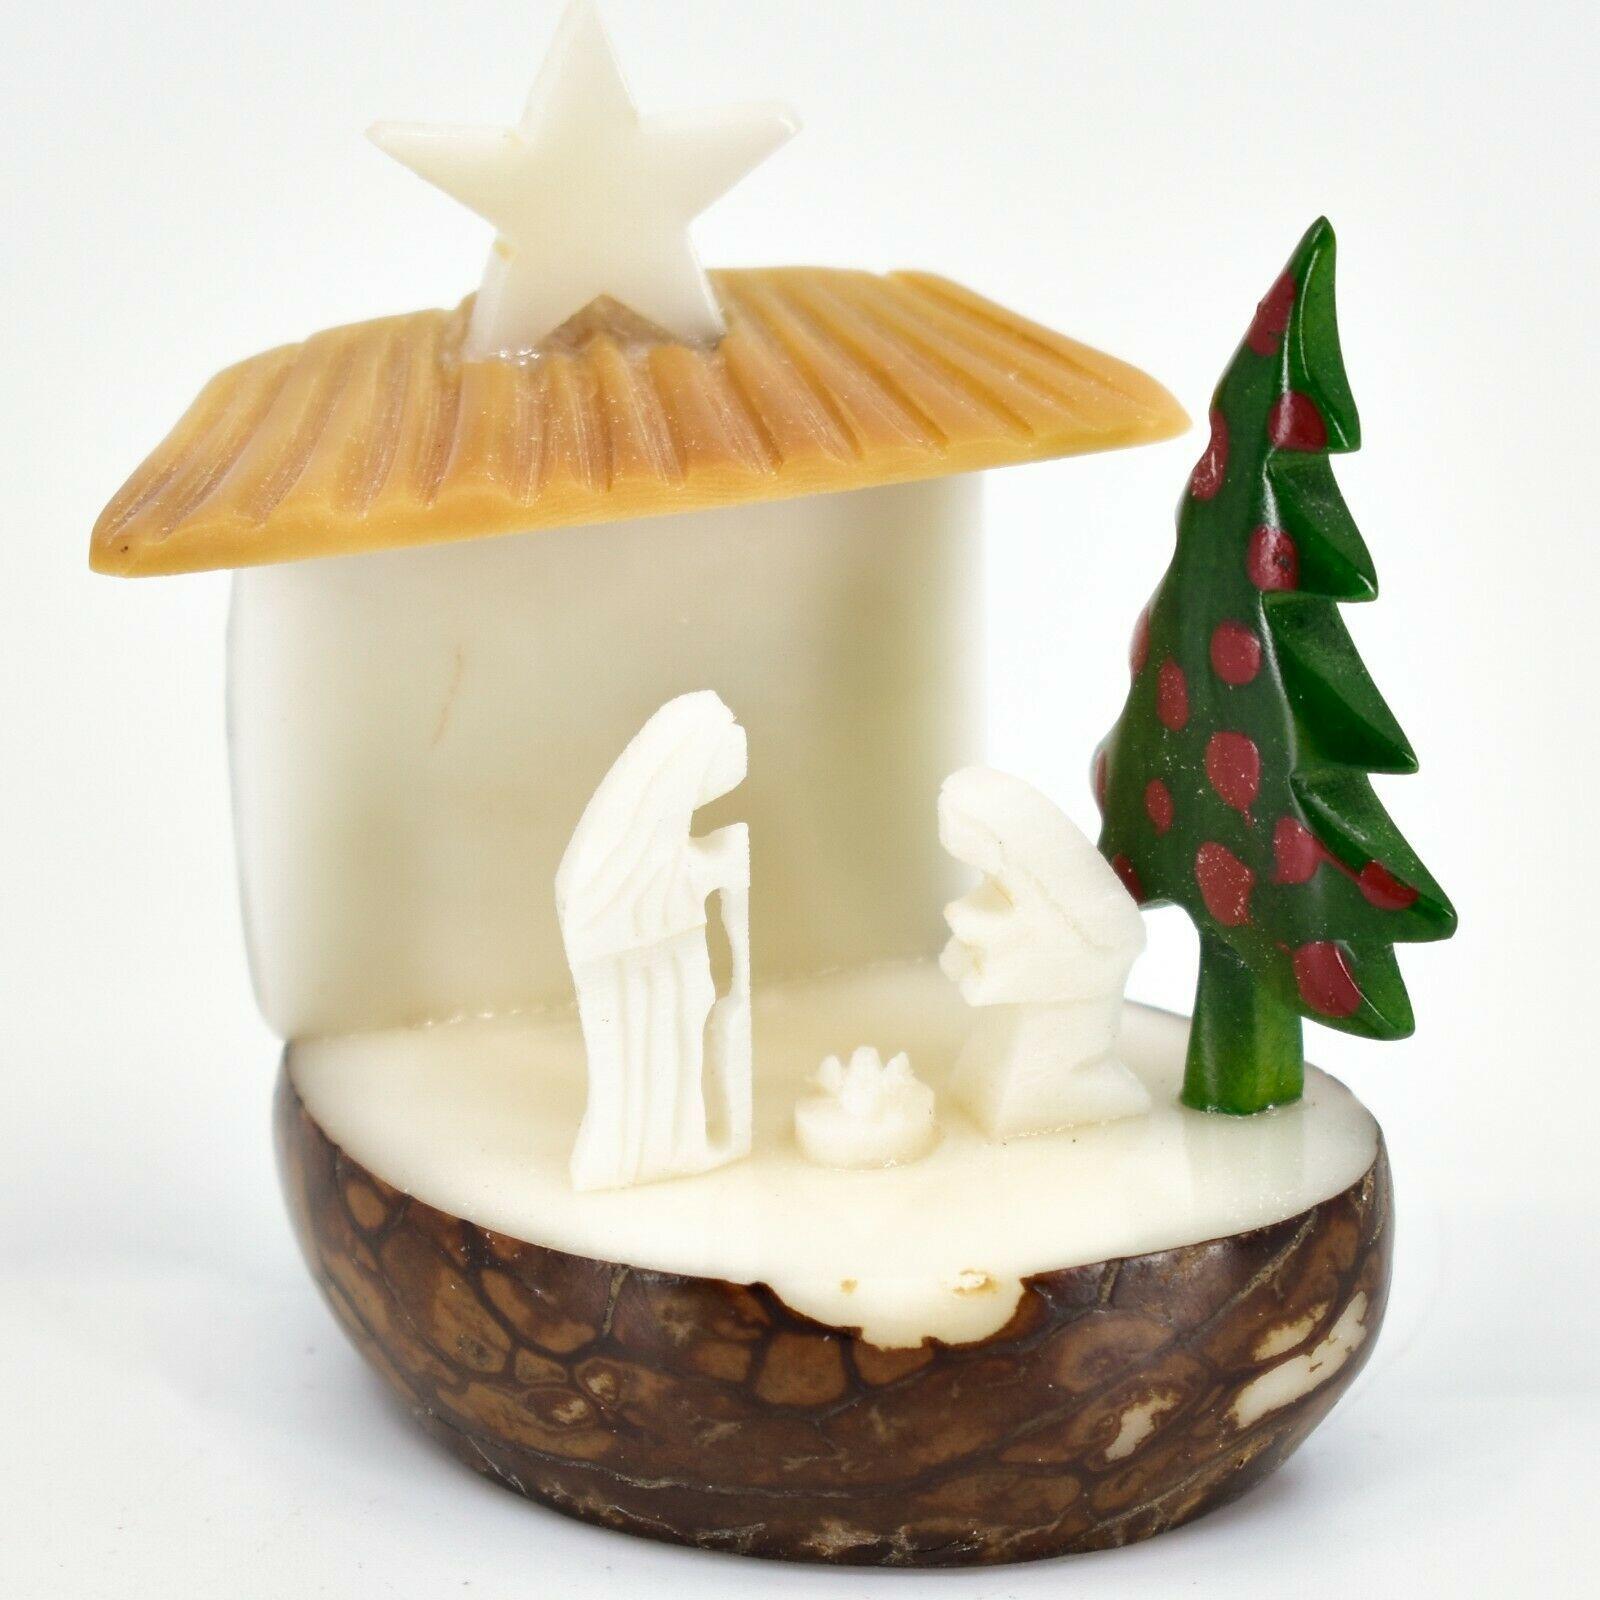 Hand Carved Tagua Nut Carving Nativity Scene Figurine w Manger & Christmas Tree